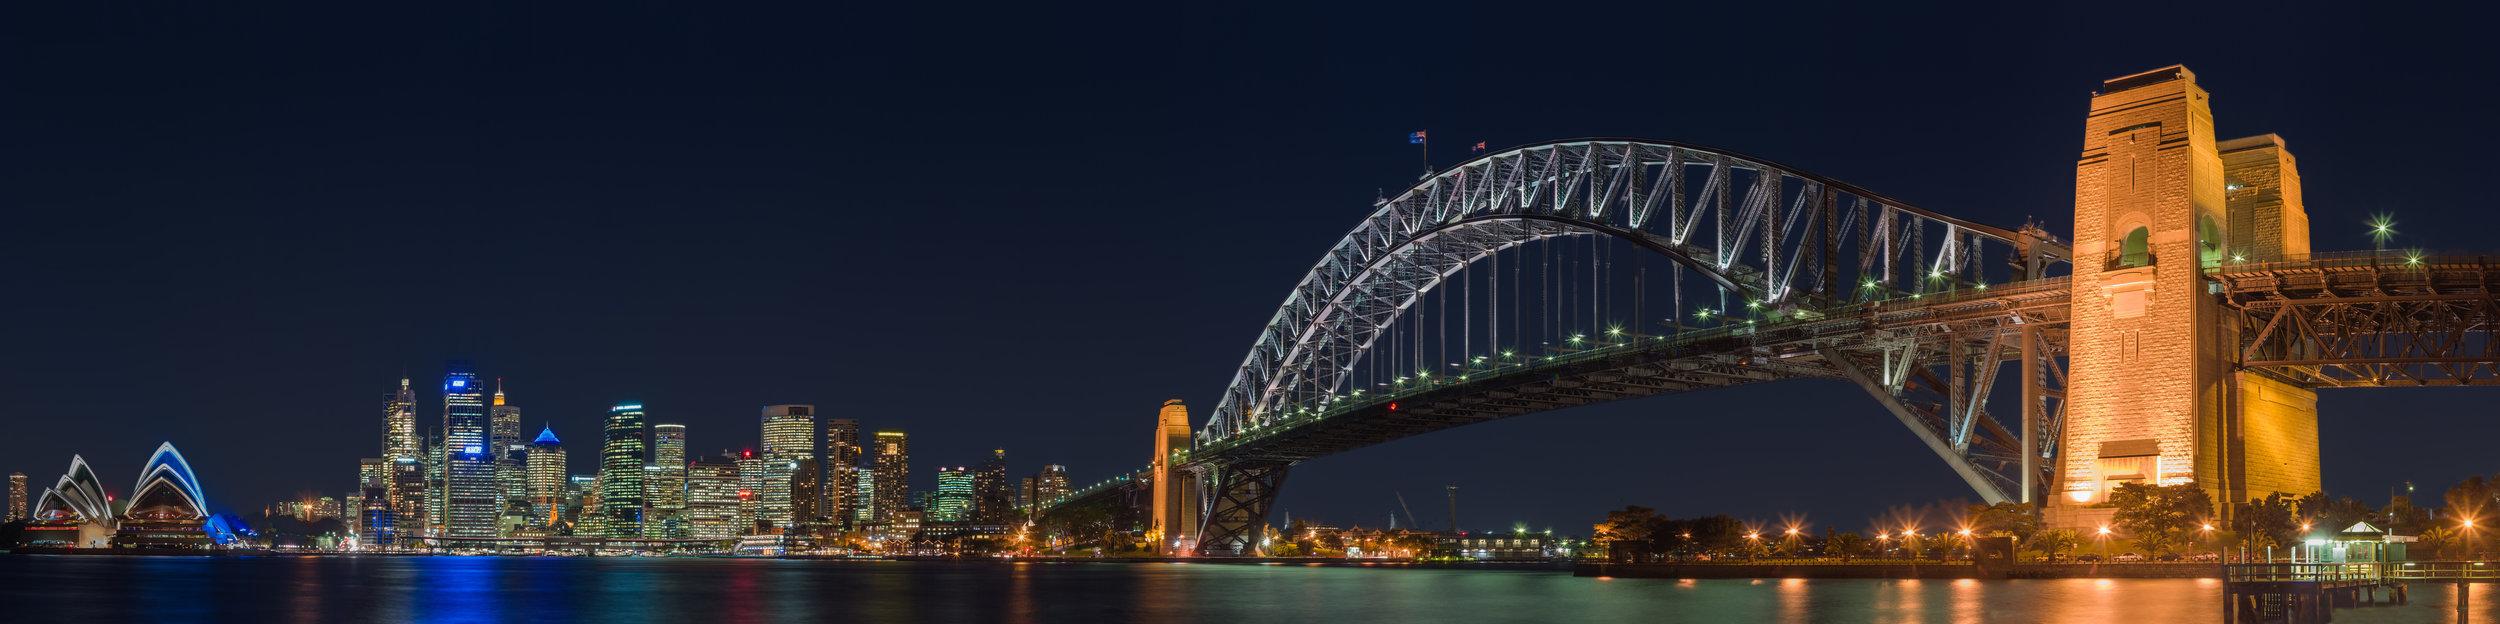 Sydney_Harbour_Bridge_night.jpg